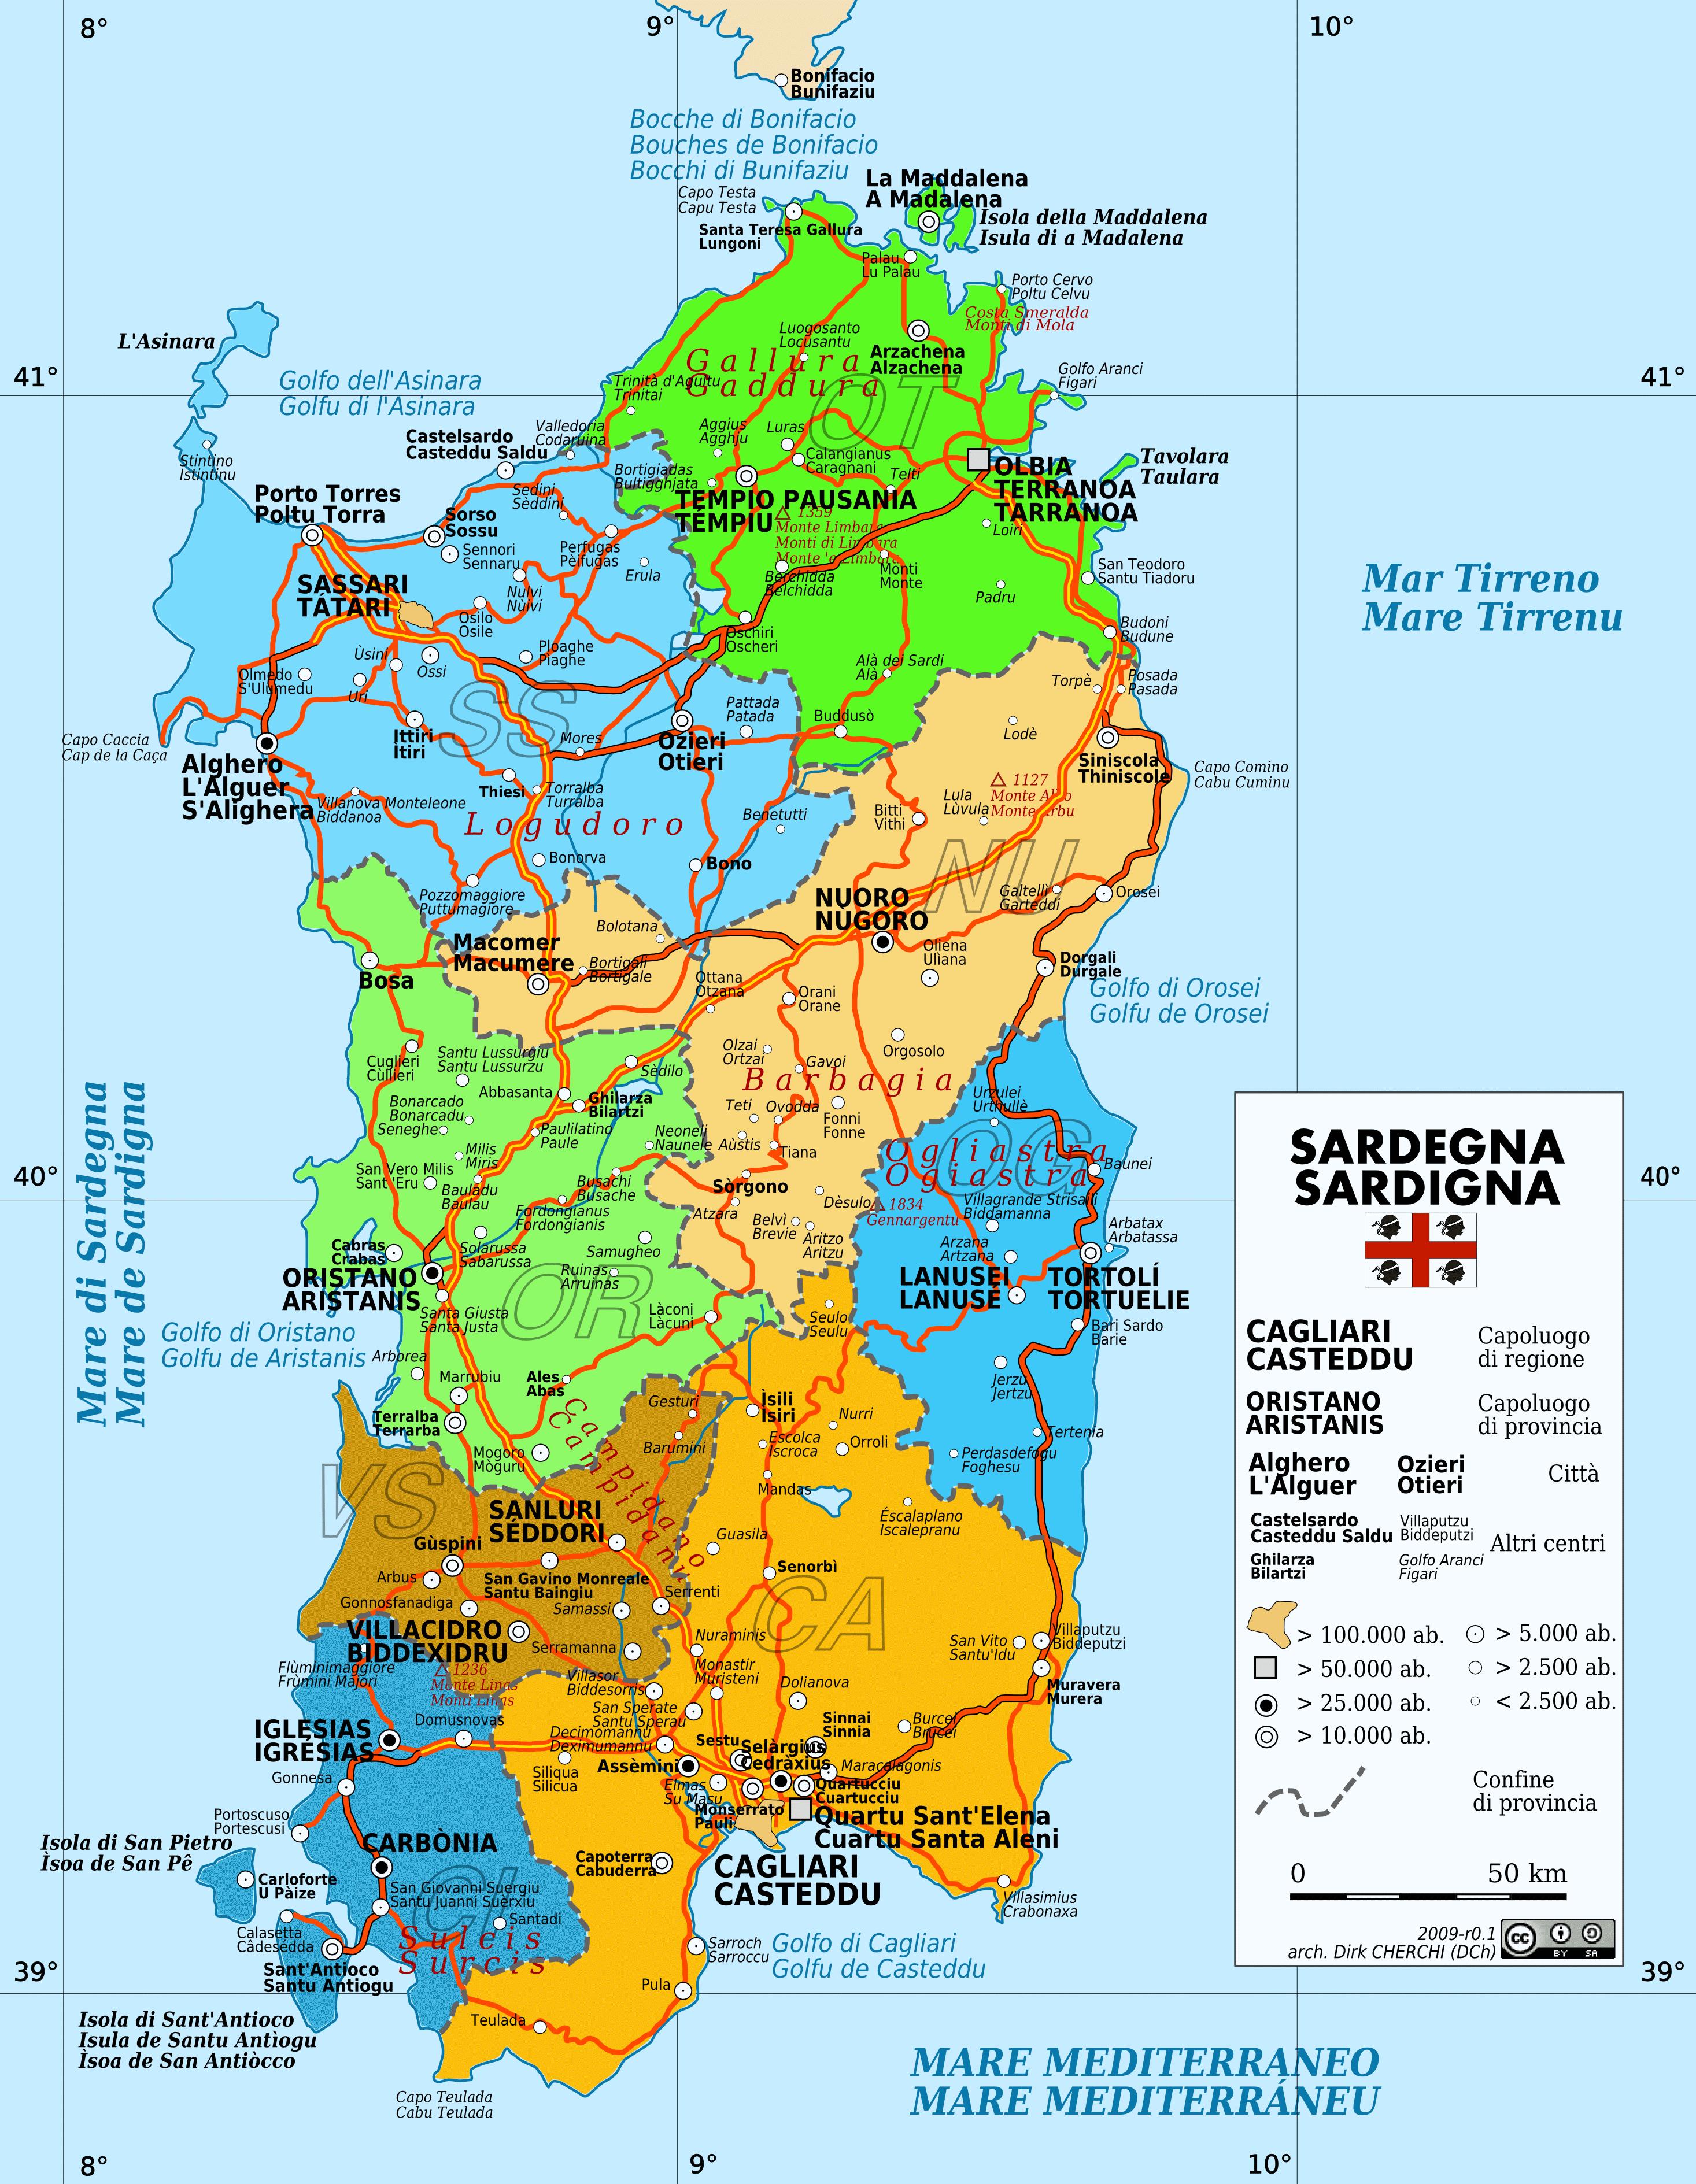 Cartina Sardegna Grande.Mappa Cartina Amministrativa Stradale Sardegna Italiano Sardo Png 2933 3778 Sardegna Sardegna Italia Mappa